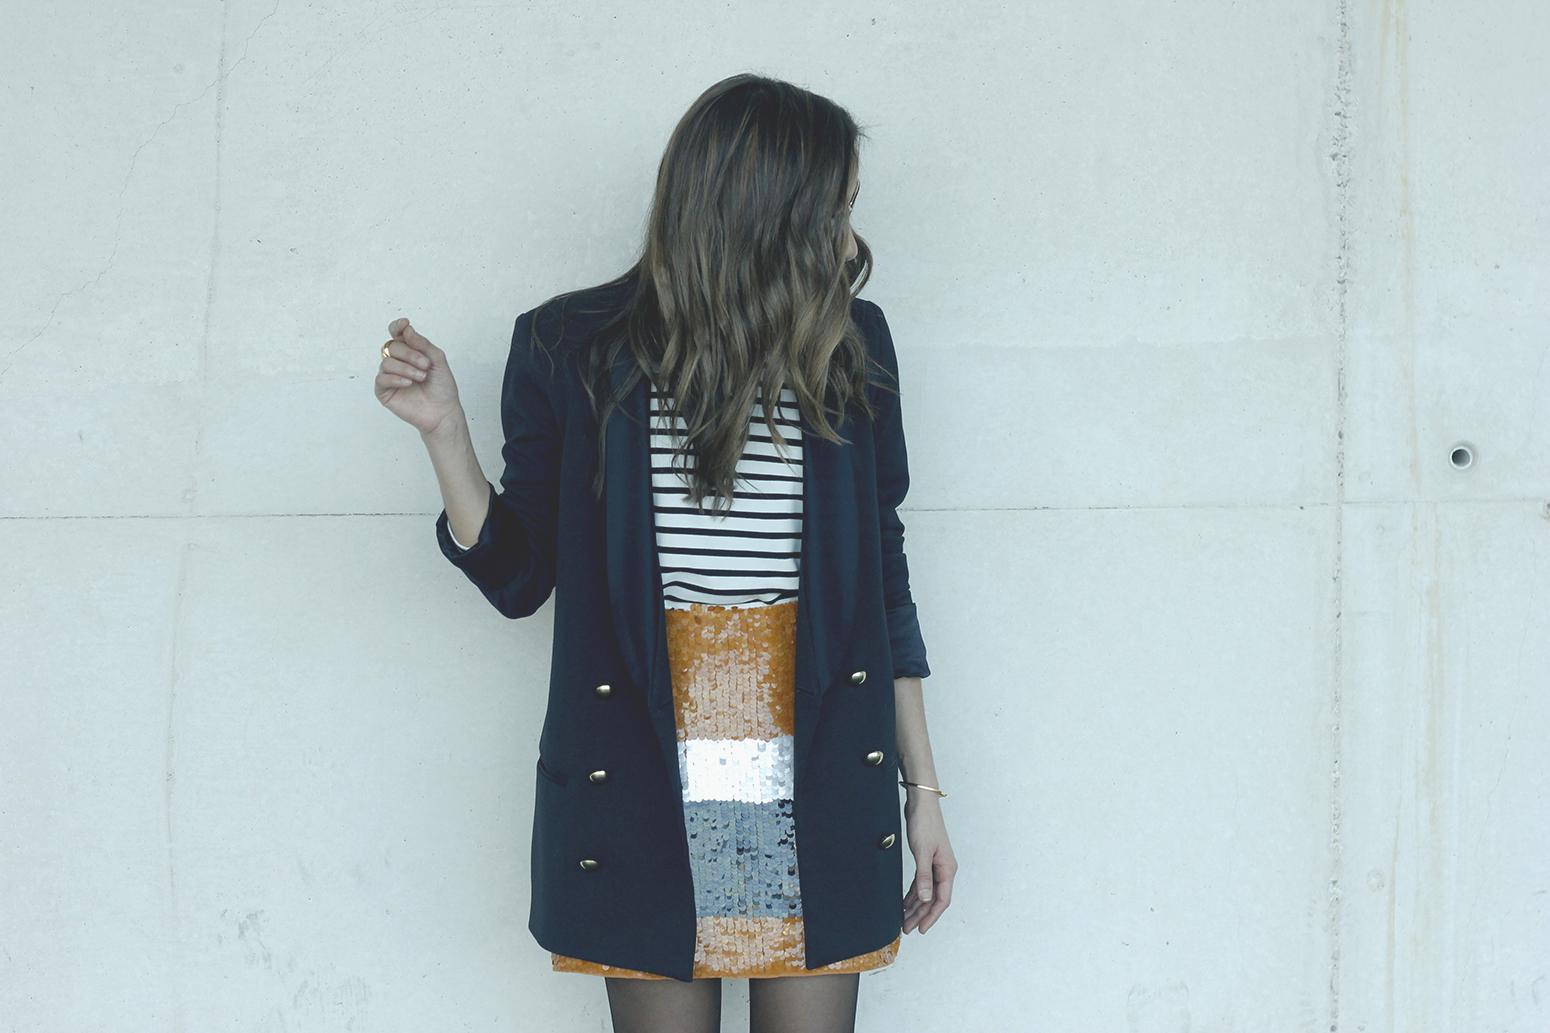 Striped T-Shirt Sequin skirt black blazer madrid fashion week street style fashion outfit04.jpg01